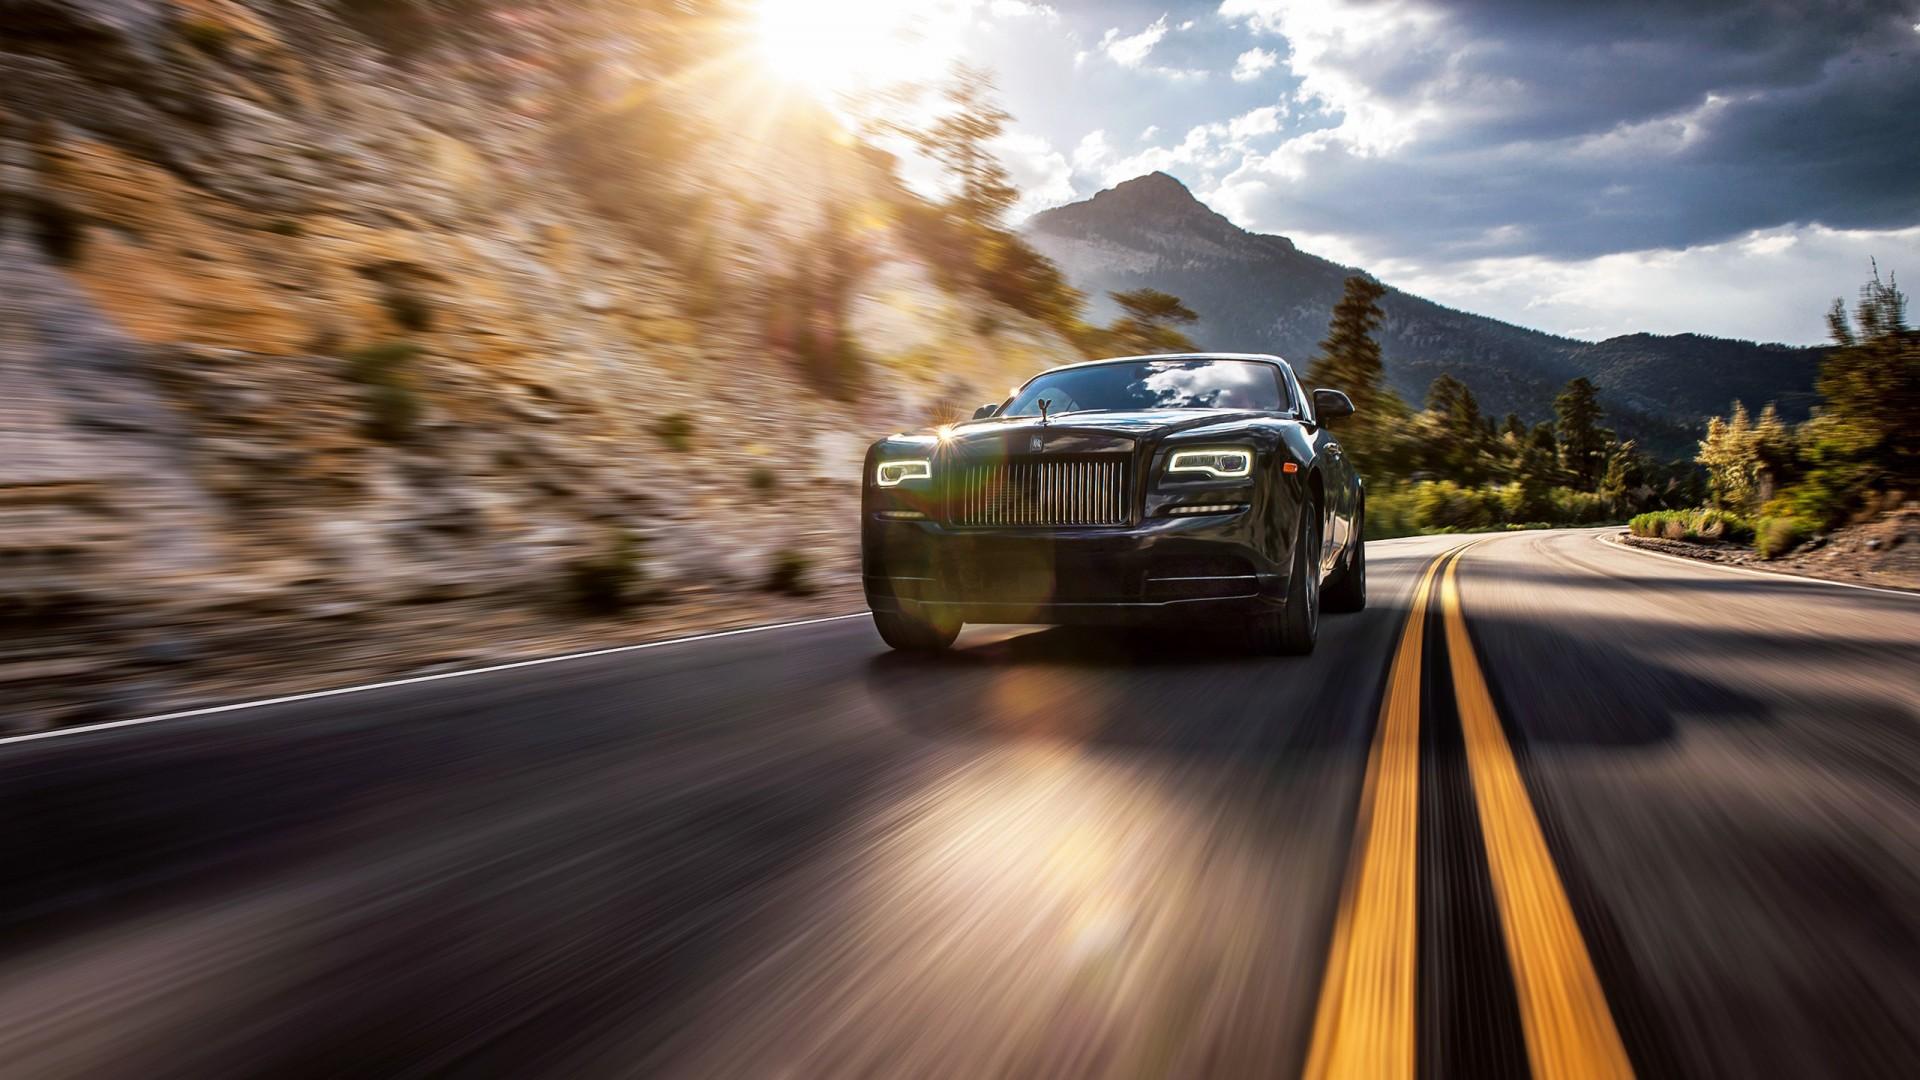 Rolls Royce Wraith >> Rolls-Royce Black Badge Wraith 2 Wallpaper | HD Car Wallpapers | ID #11729